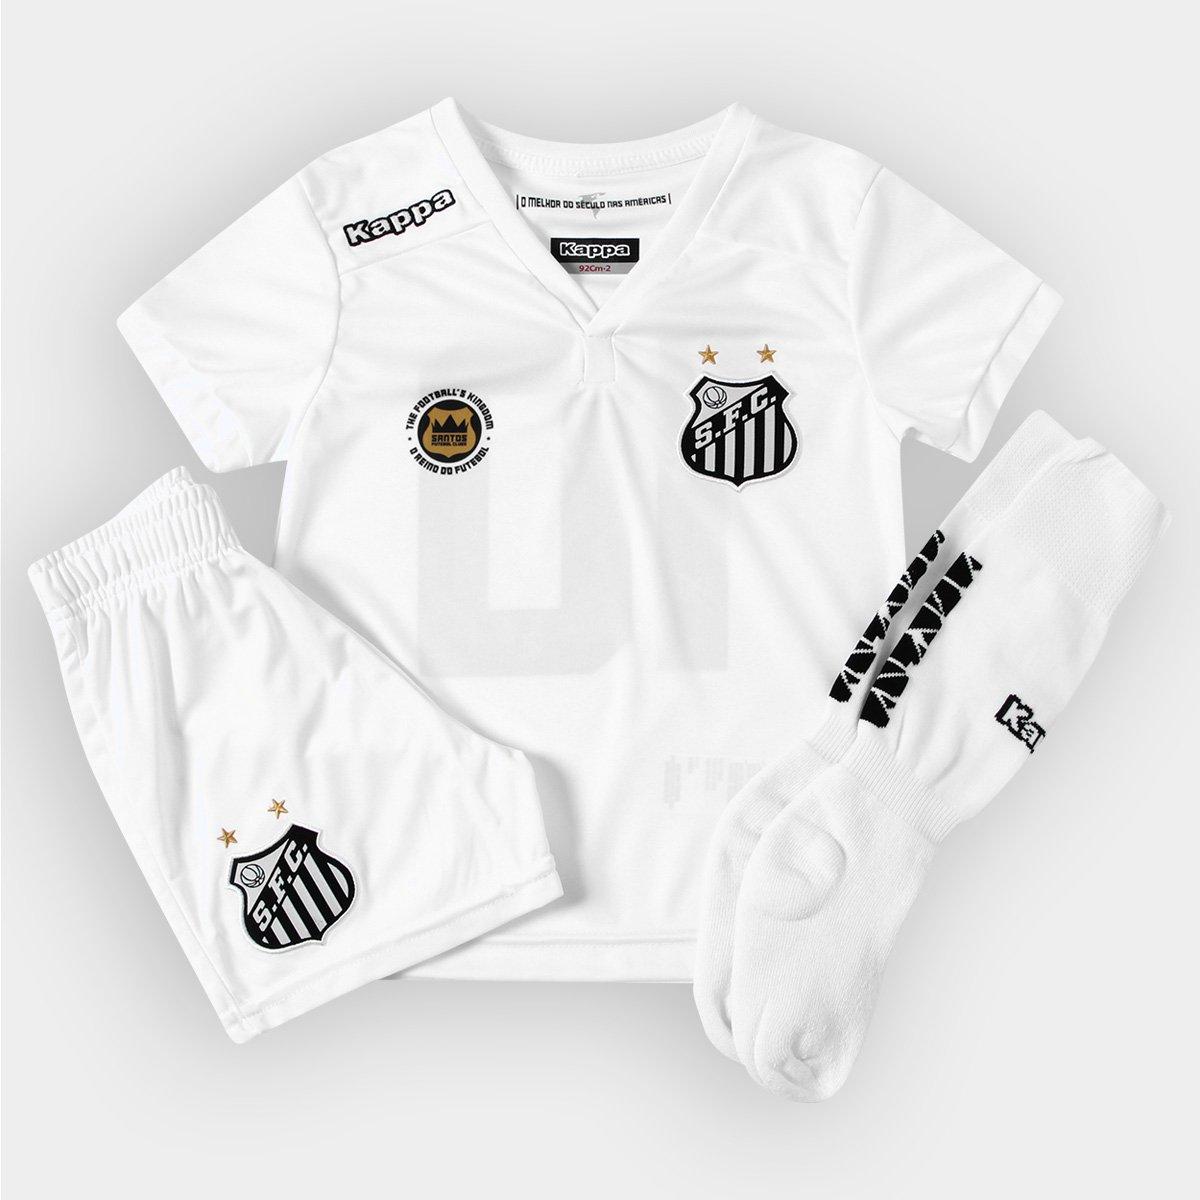 Kit Kappa Santos I 2016 nº 10 - Infantil - Compre Agora  eeb4abf5f13a7